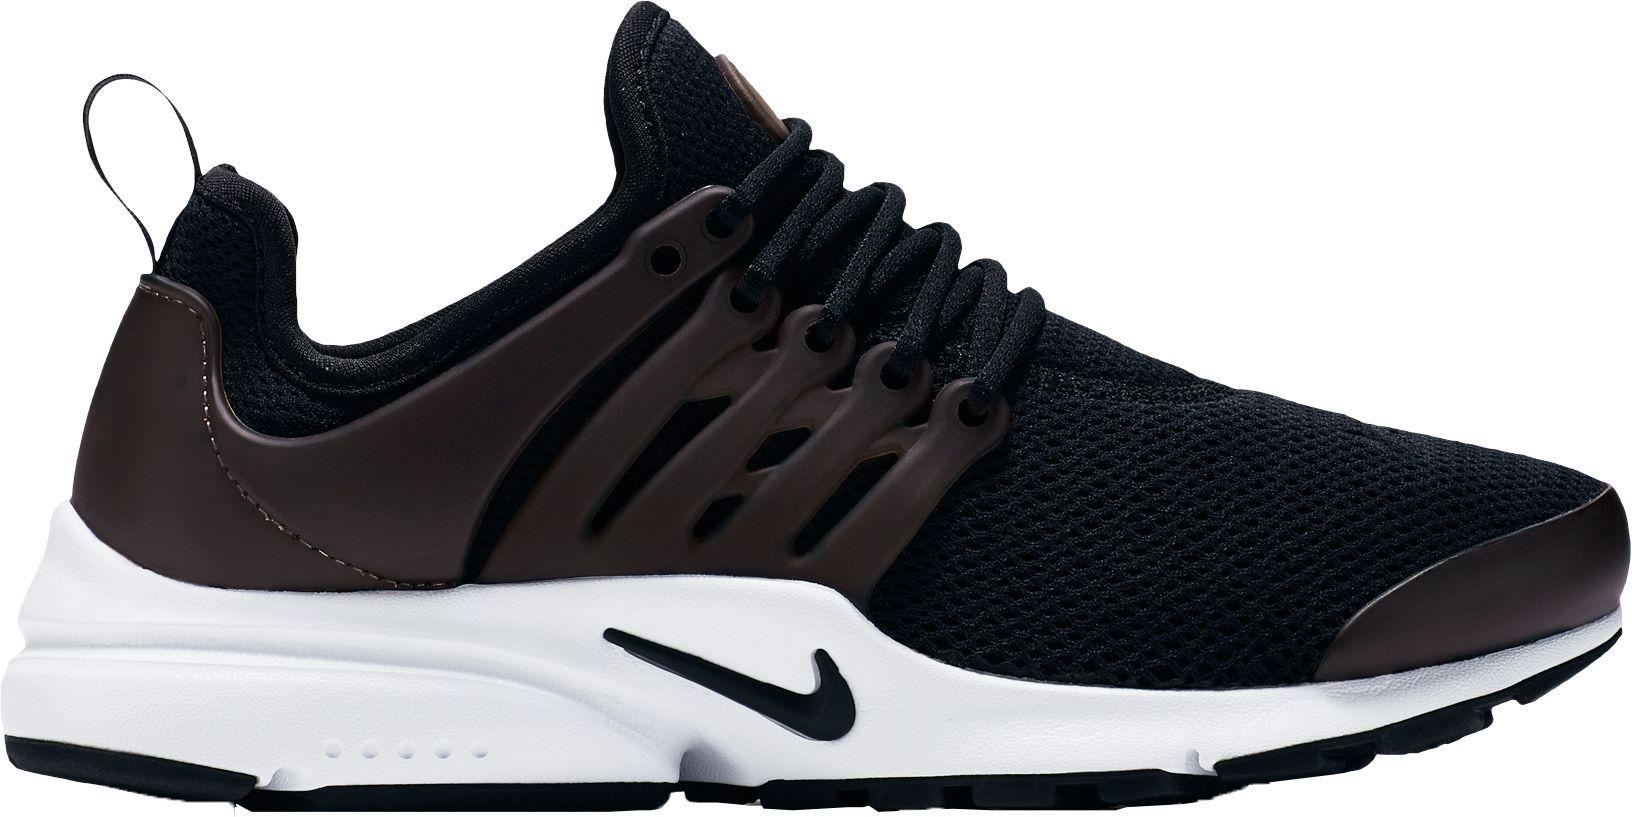 best website 21d39 f0257 Nike Womens Air Presto Shoes, Size 11.0, Black